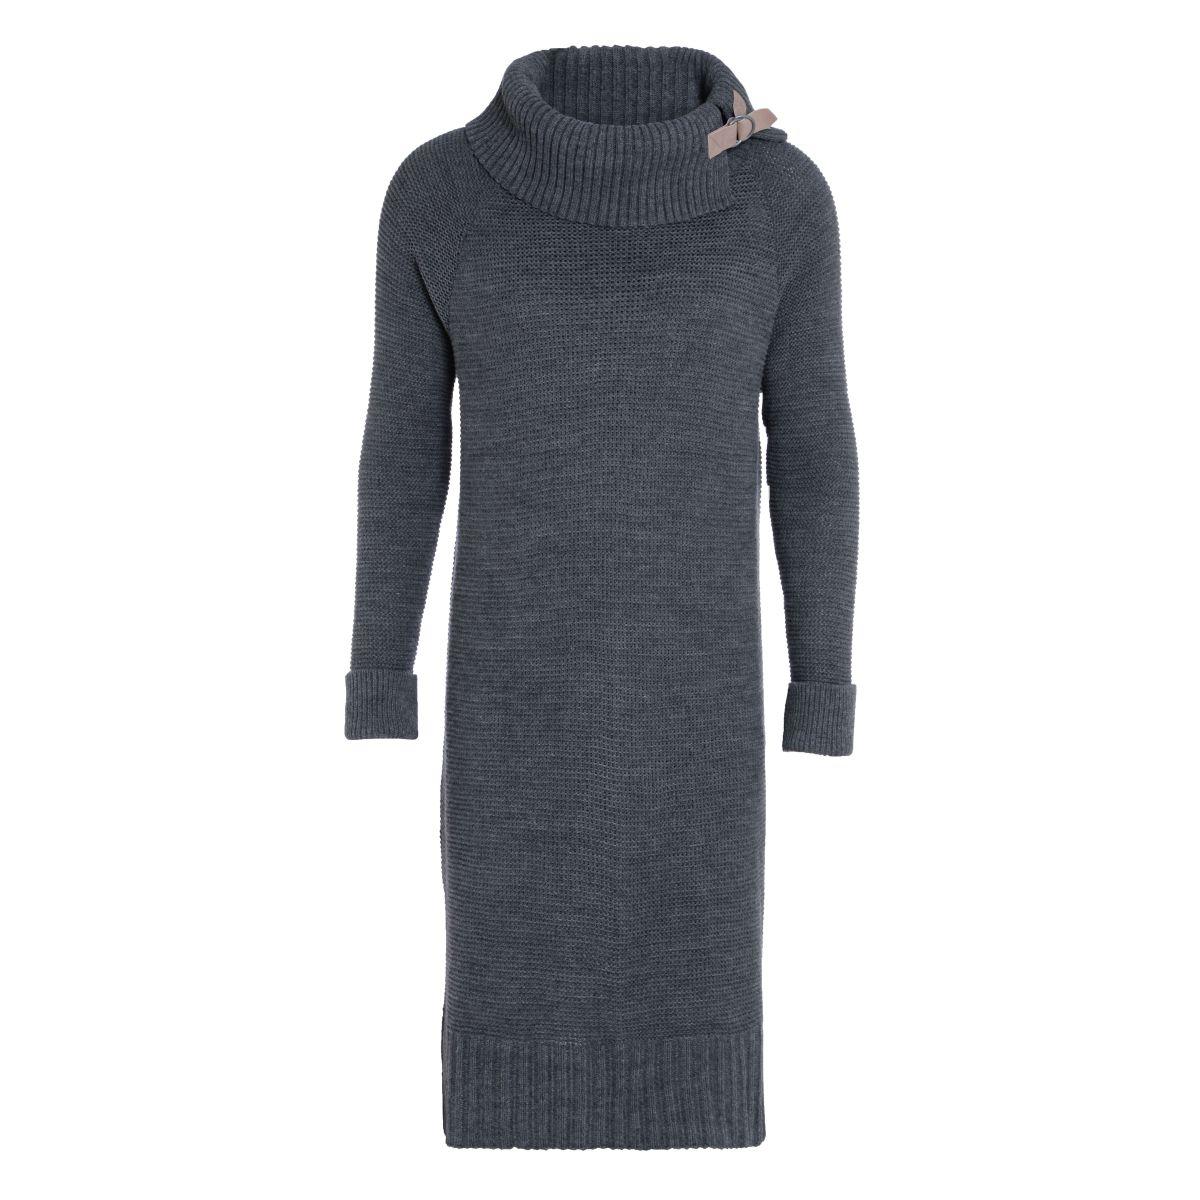 jamie gebreide jurk antraciet 4042